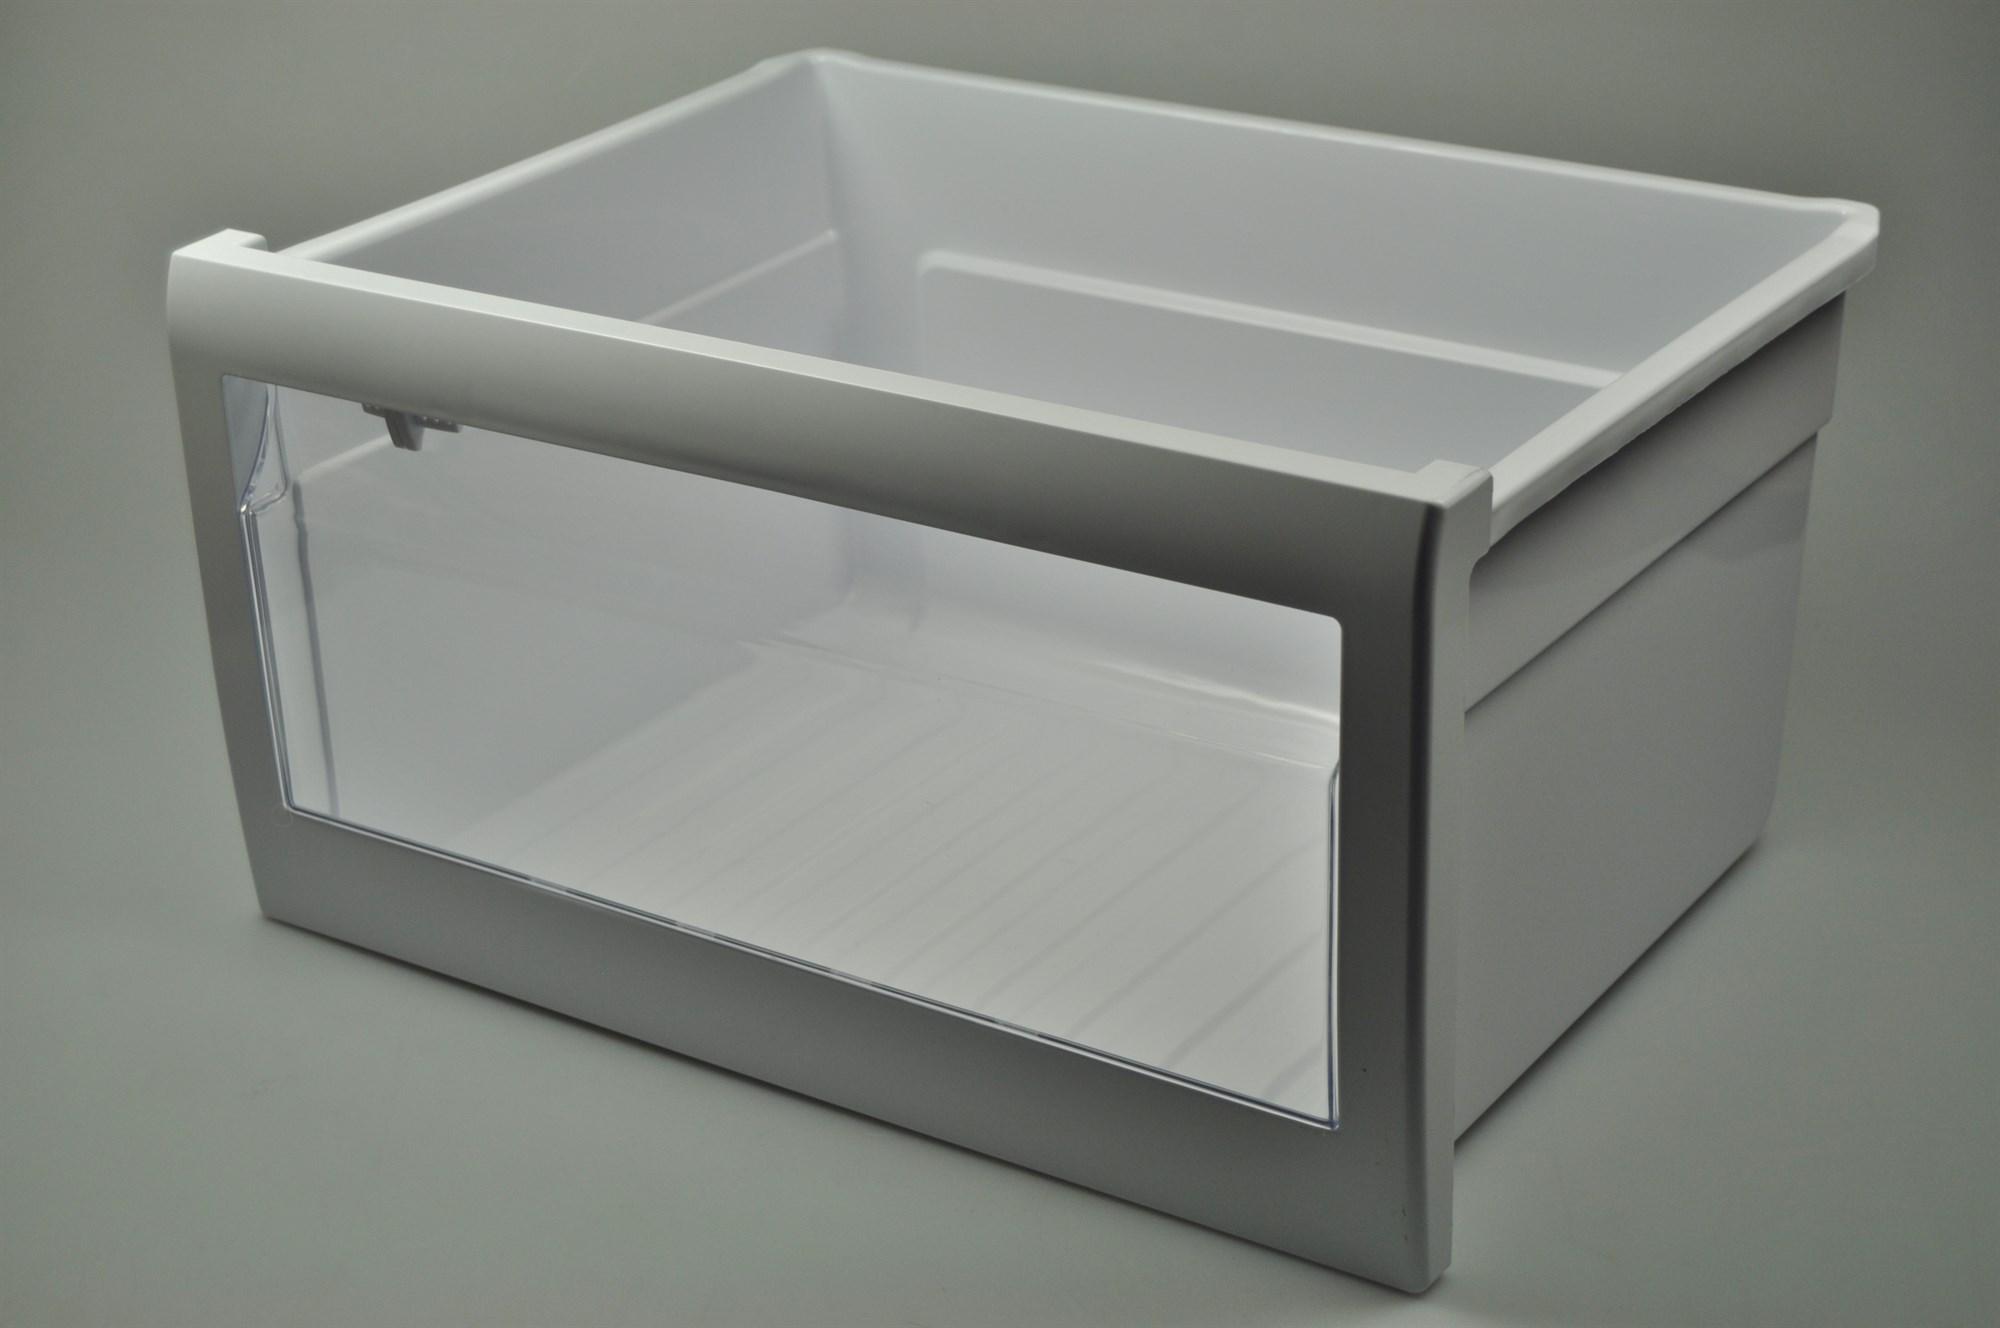 bac l gumes samsung r frig rateur cong lateur style am ricain. Black Bedroom Furniture Sets. Home Design Ideas